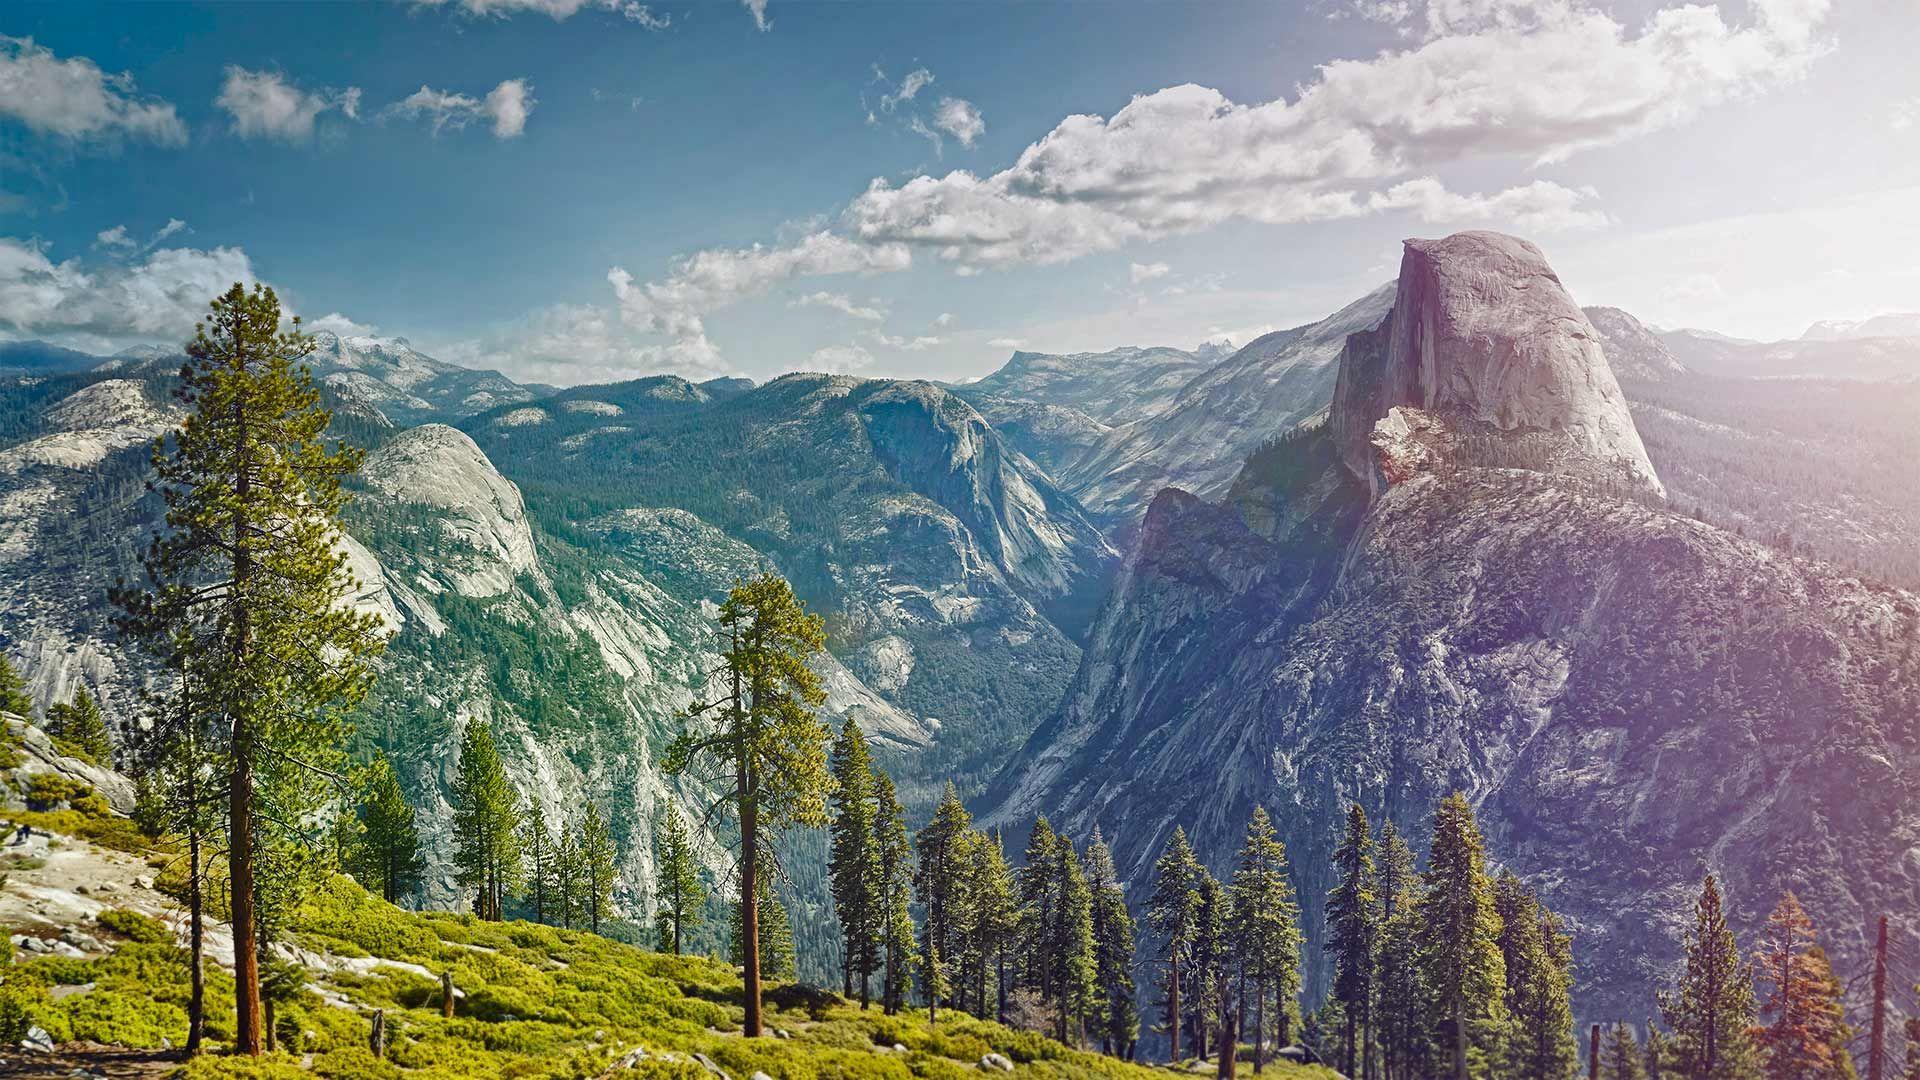 Yosemite National Park, California (© James O'Neil/Getty